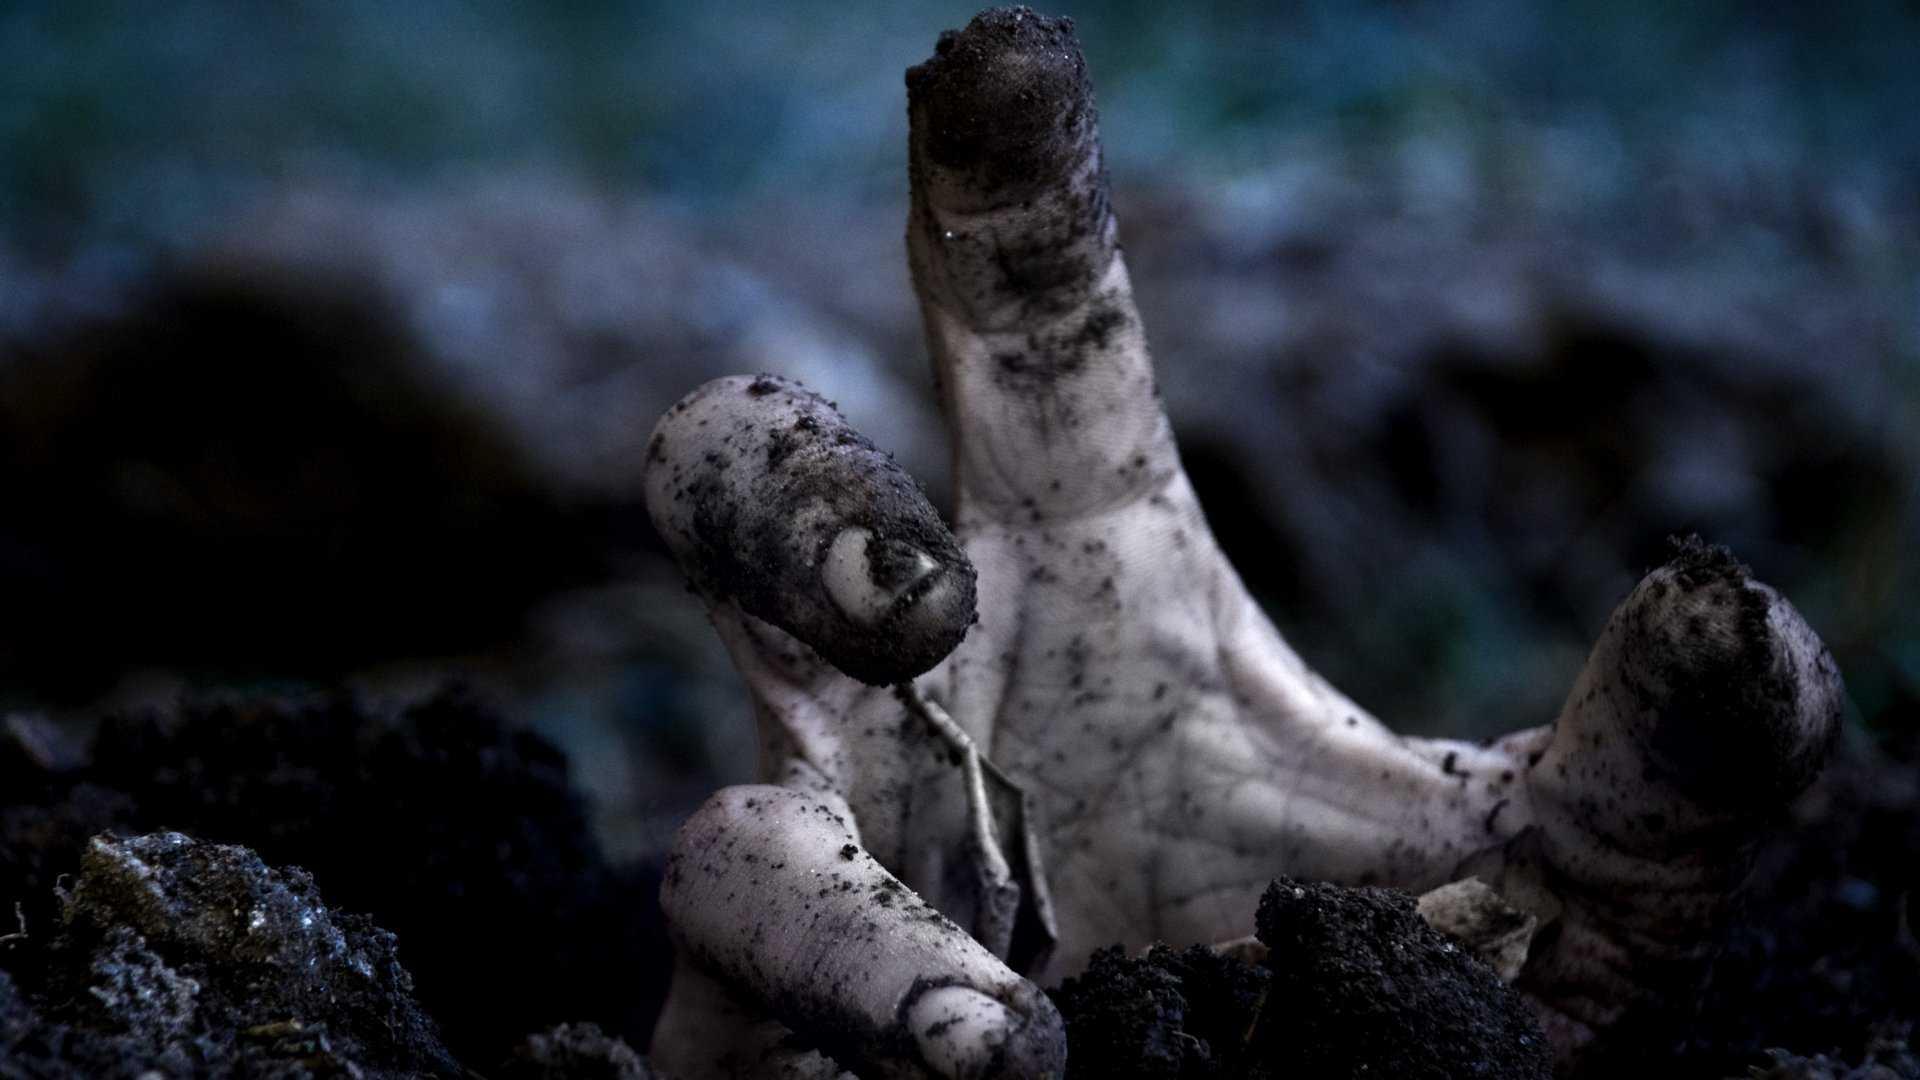 Creepy-HandPicked-Horror-Smashing-Magazine-wallpaper-wp3404267